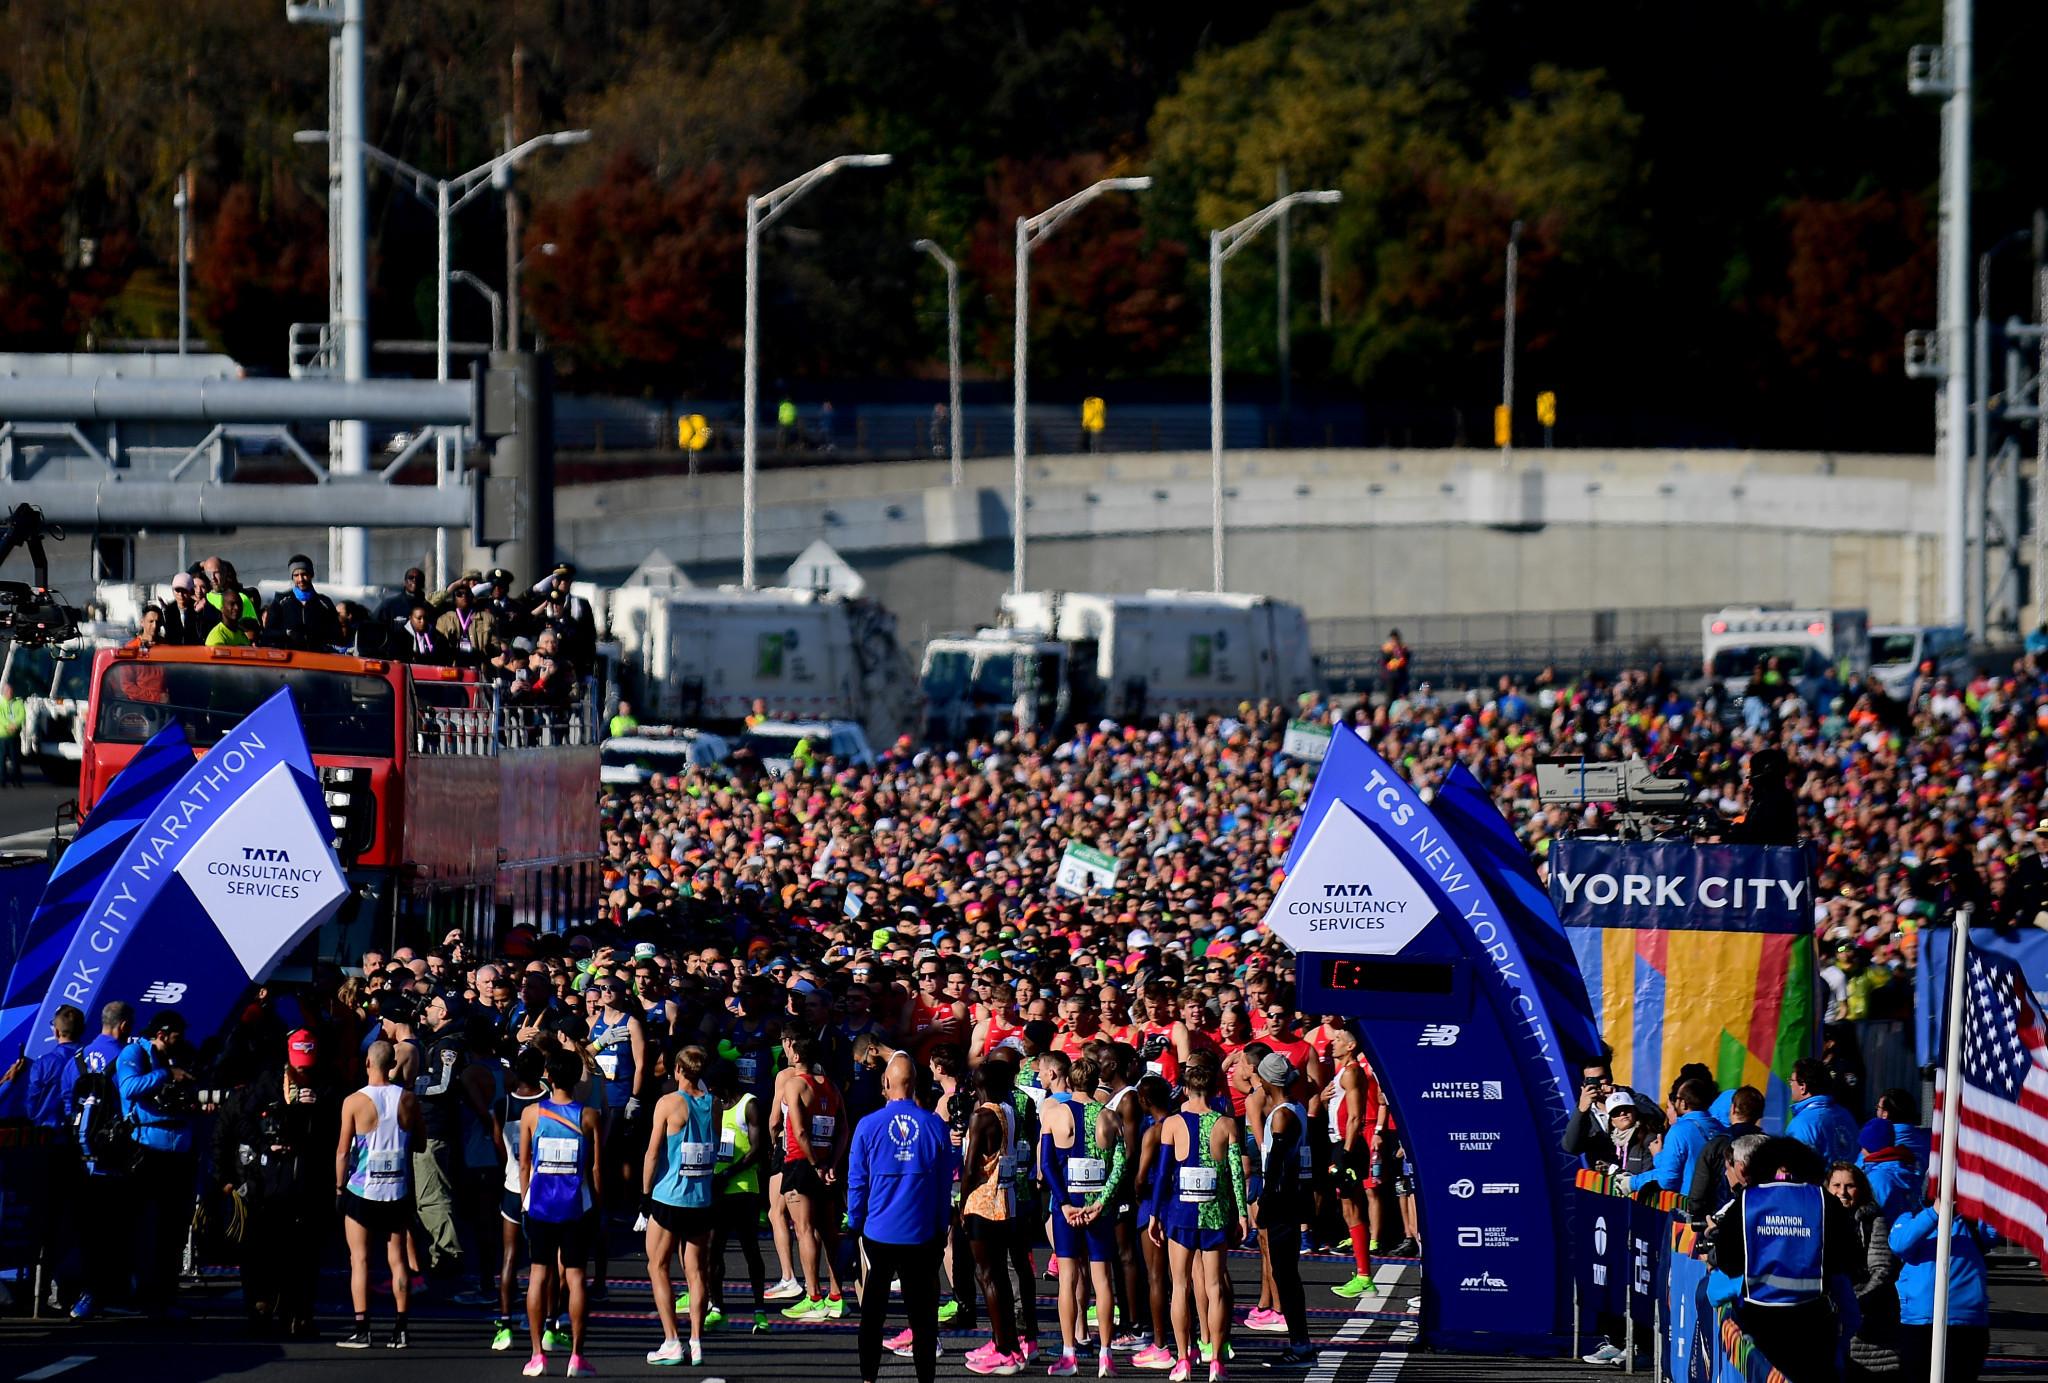 TCS extends title sponsorship of New York City Marathon to 2029